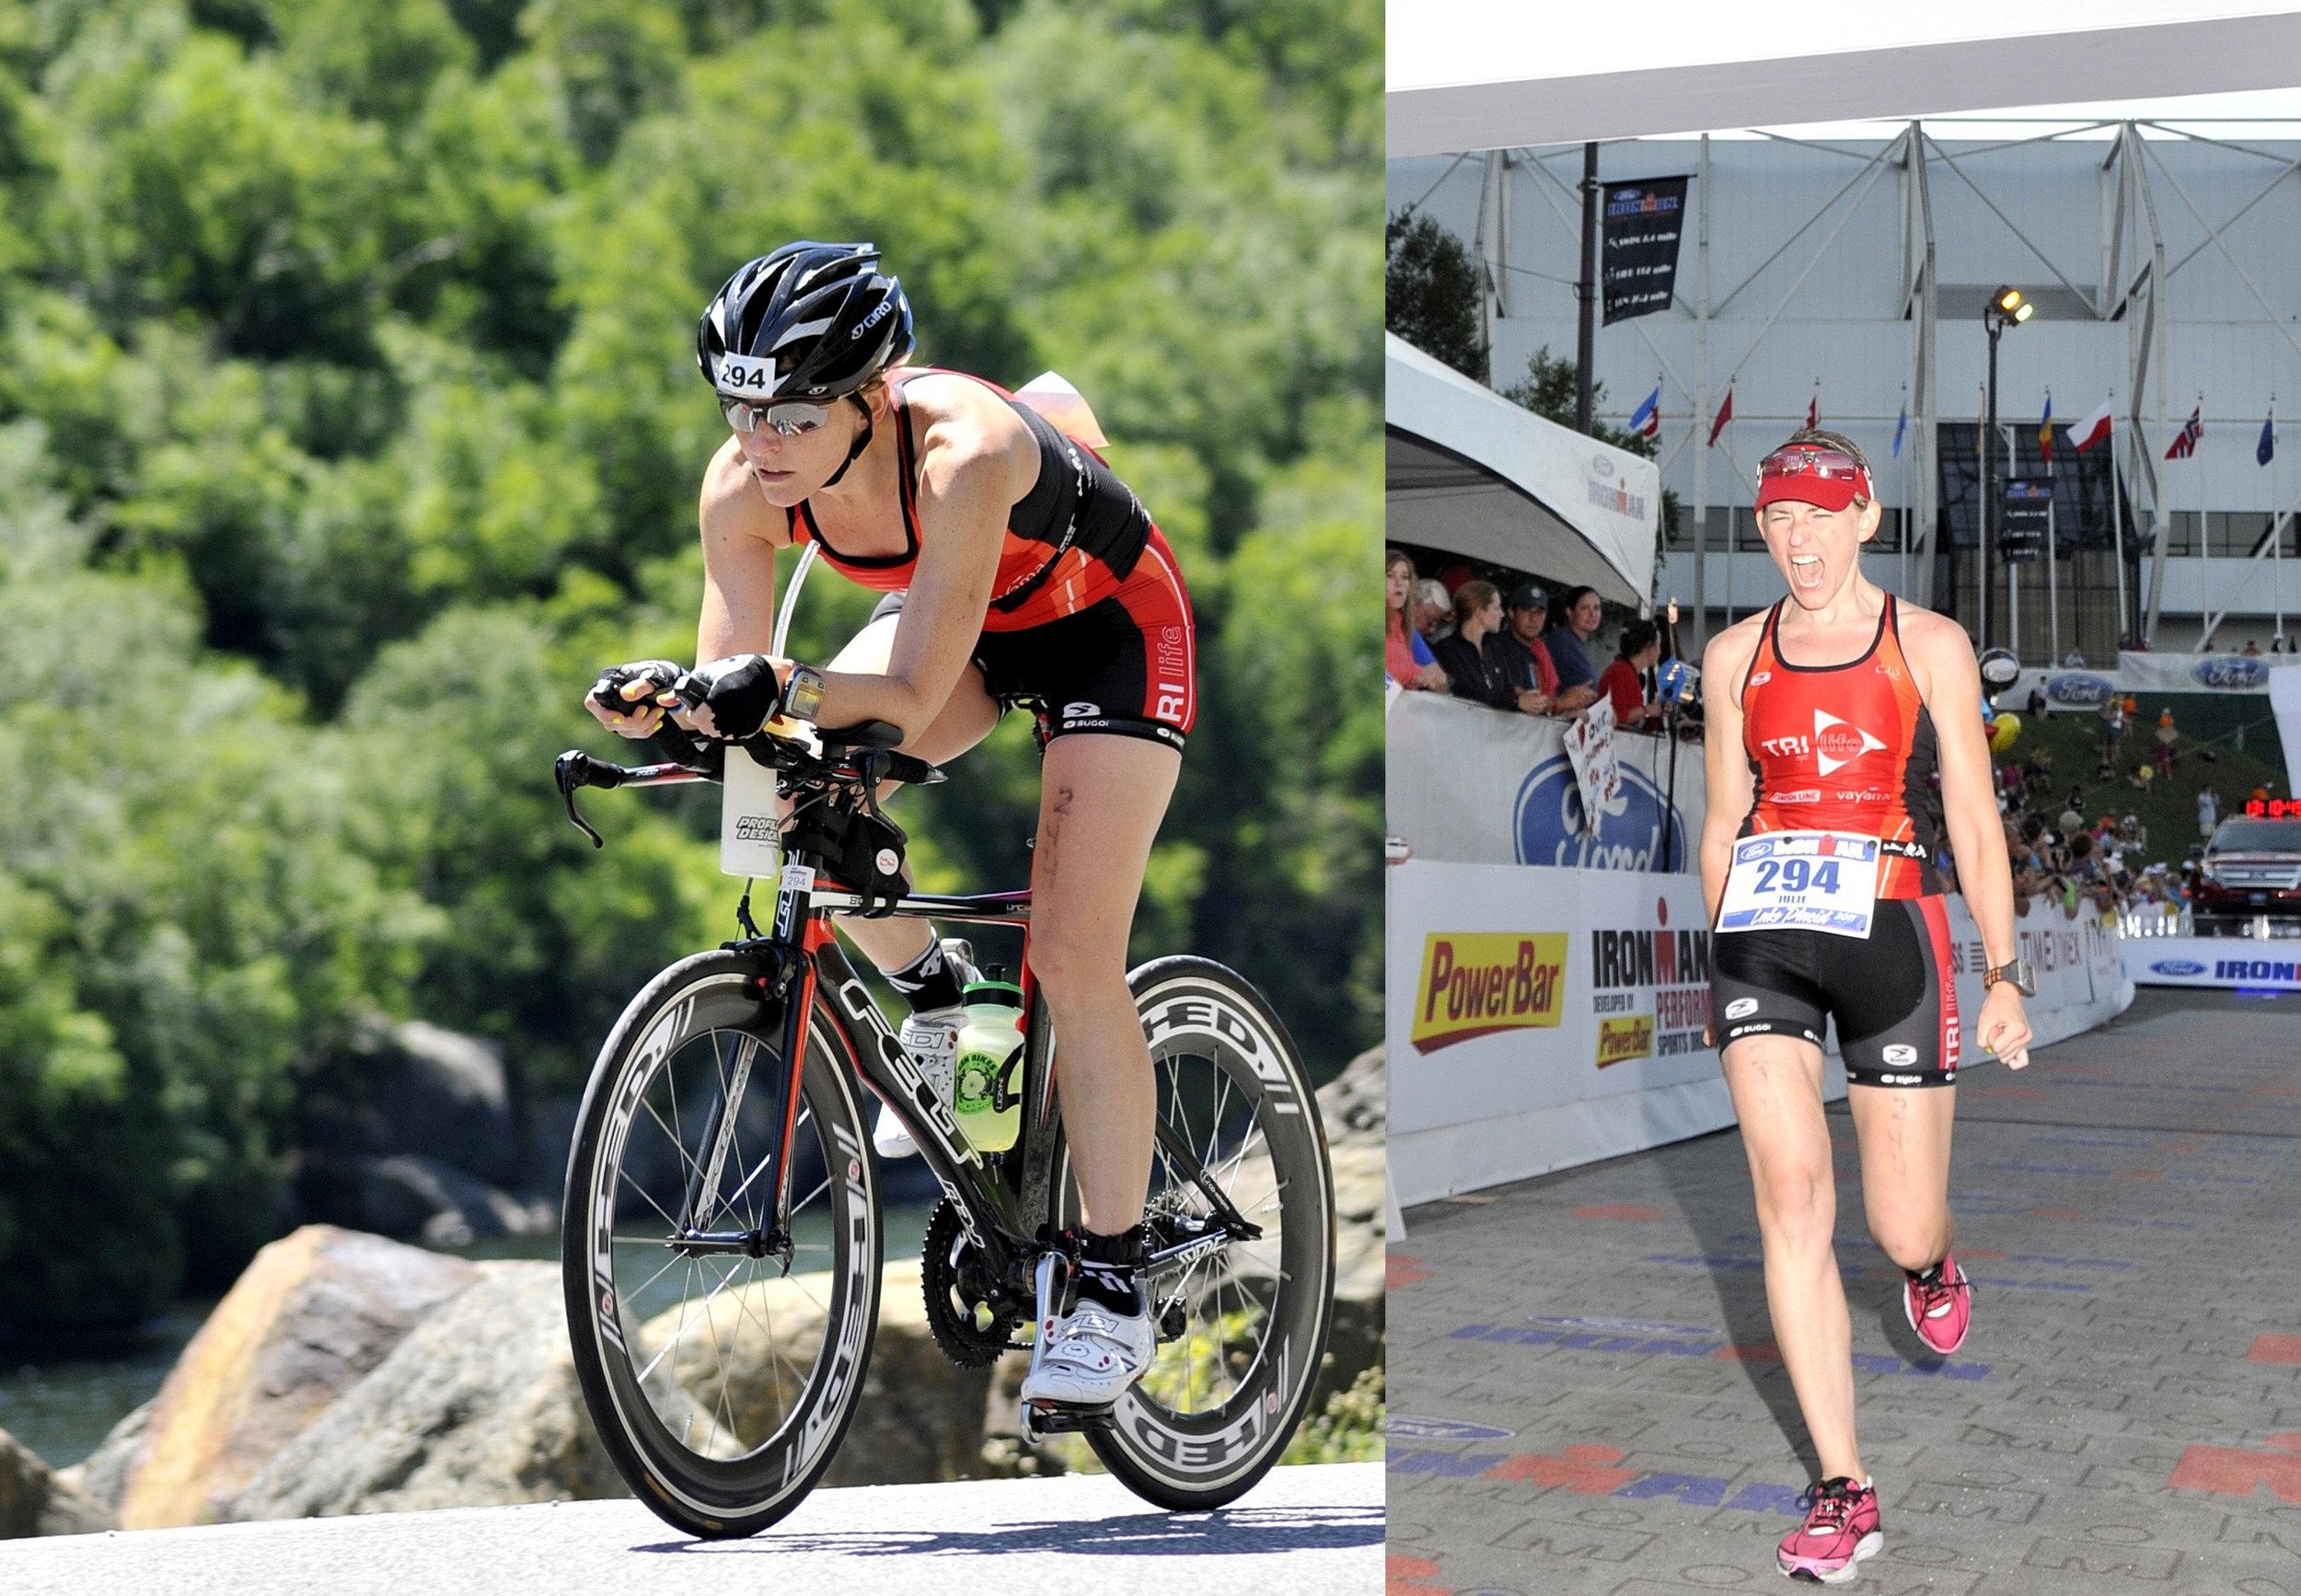 JULES L.  Ironman Triathlete, Ultra Marathoner, Creative Director, Mom x 2